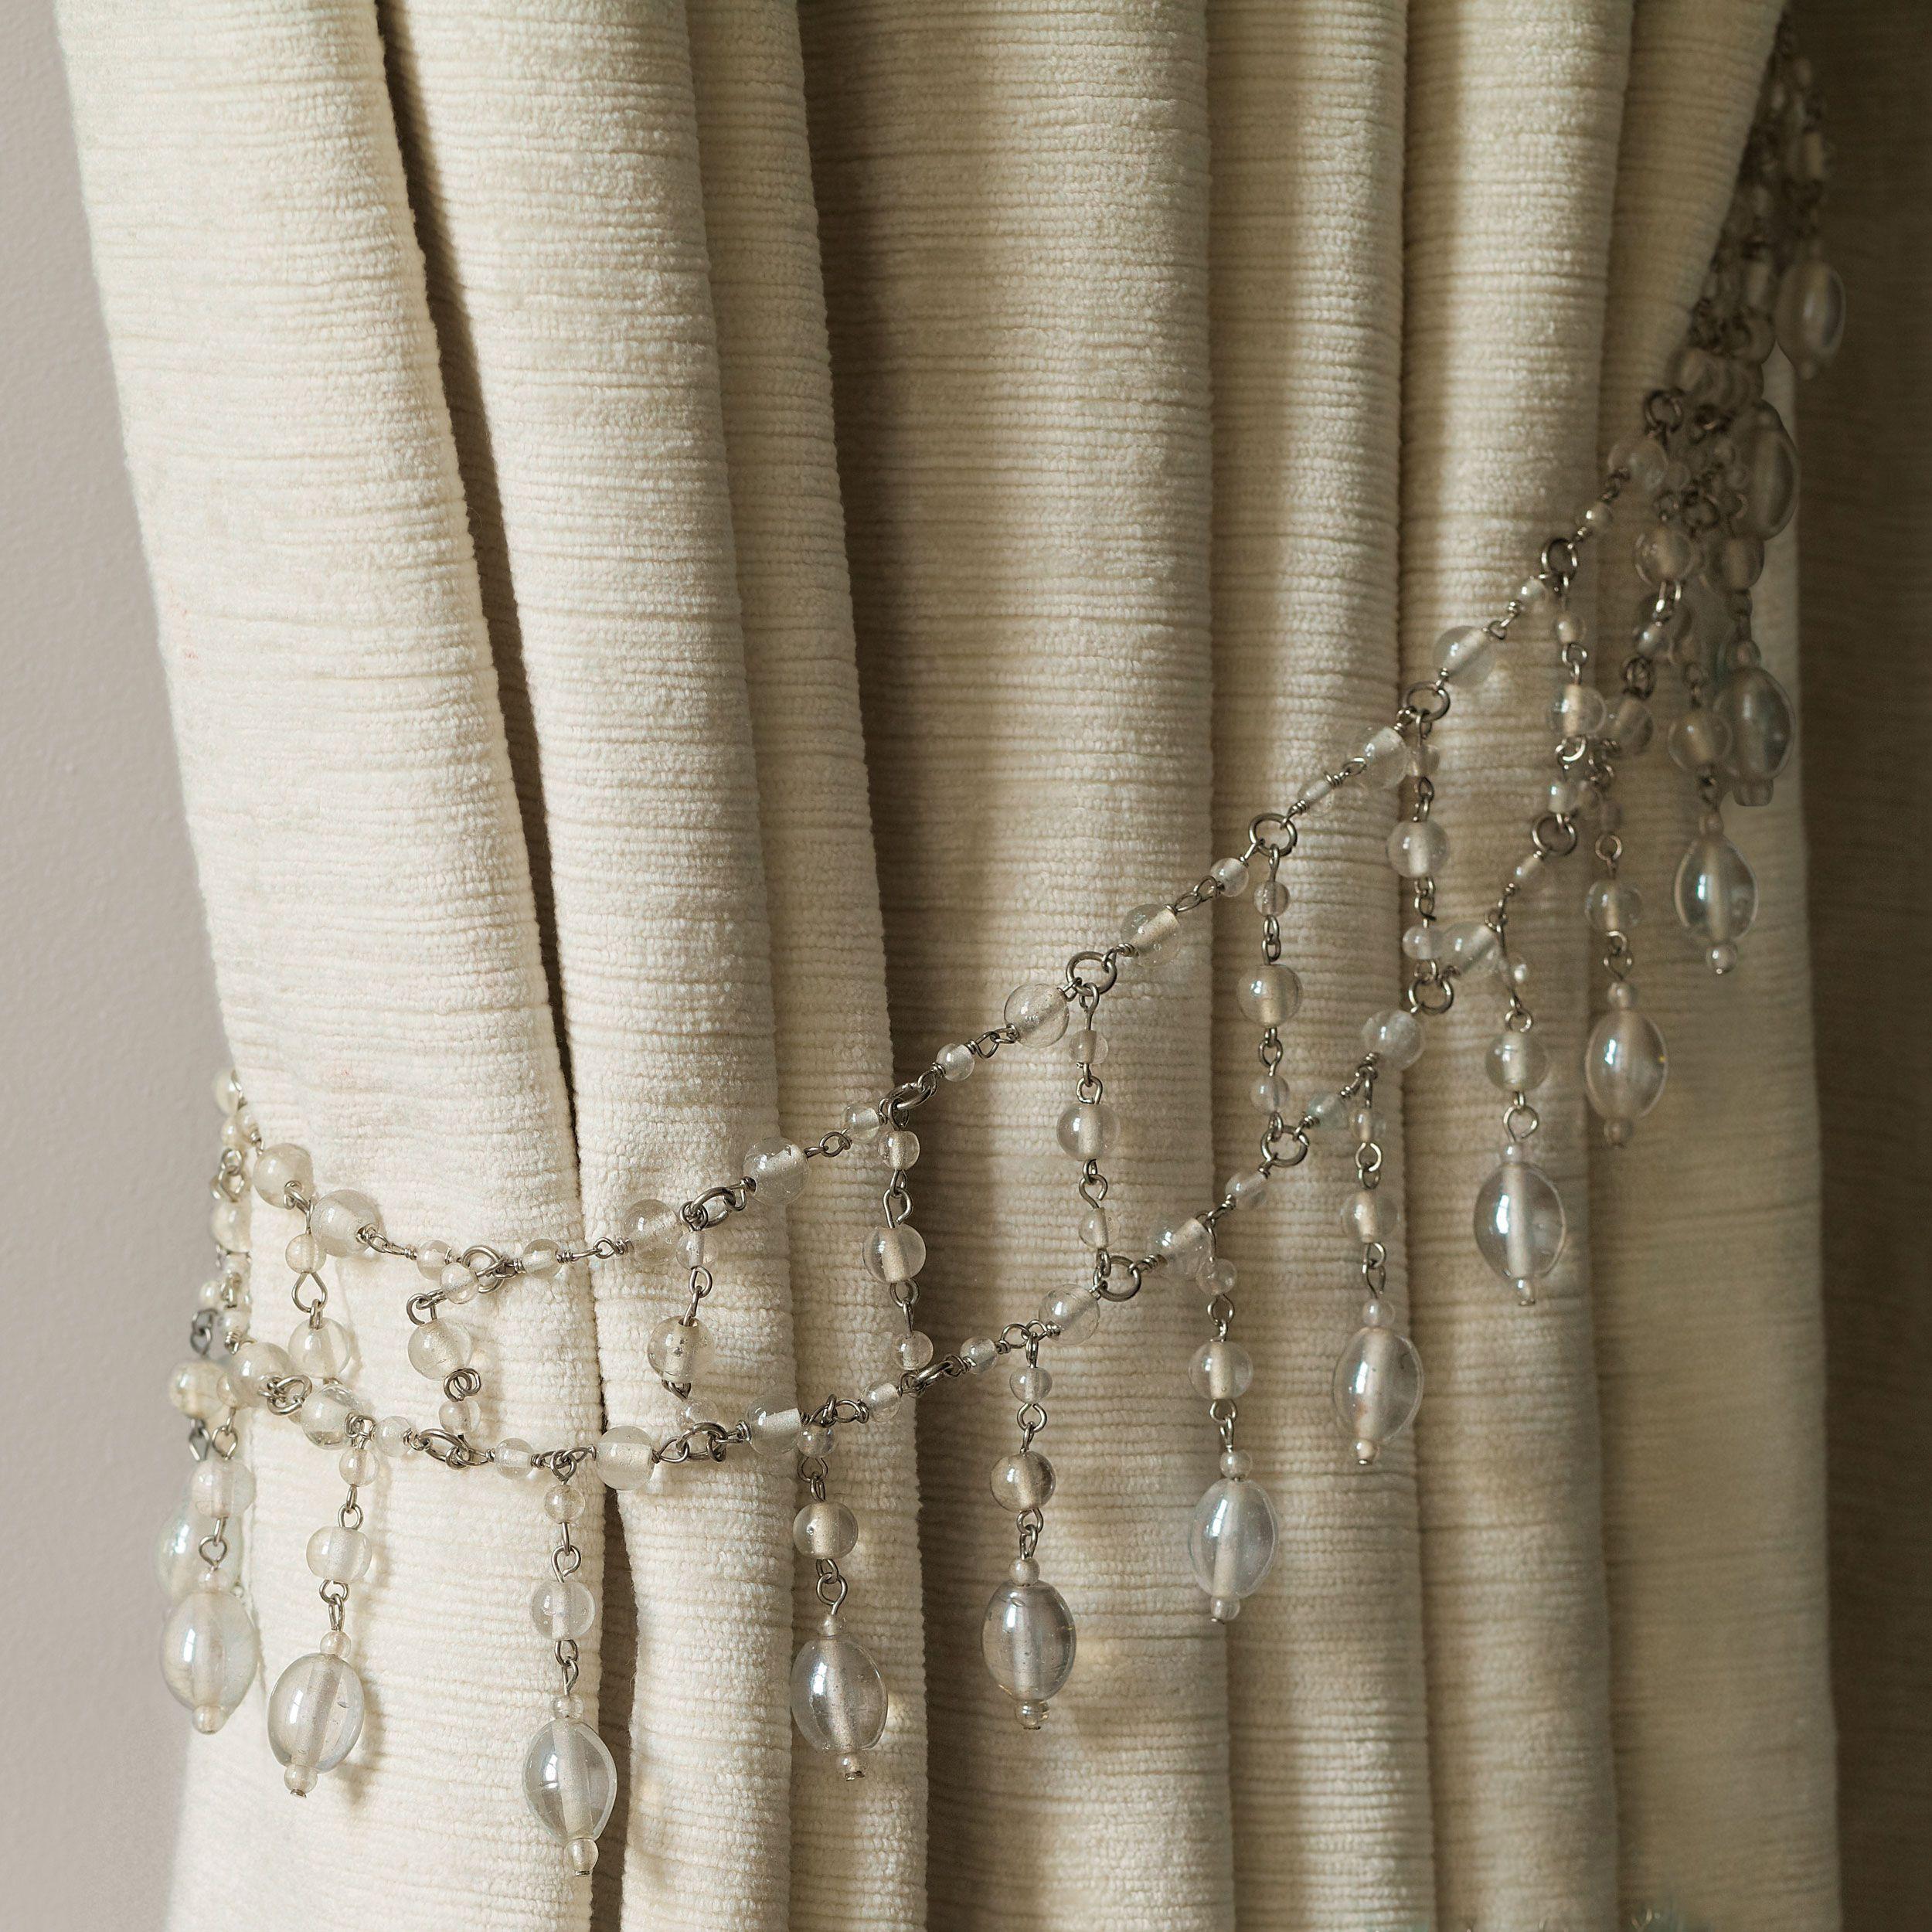 backs tassels evie glass bead curtain